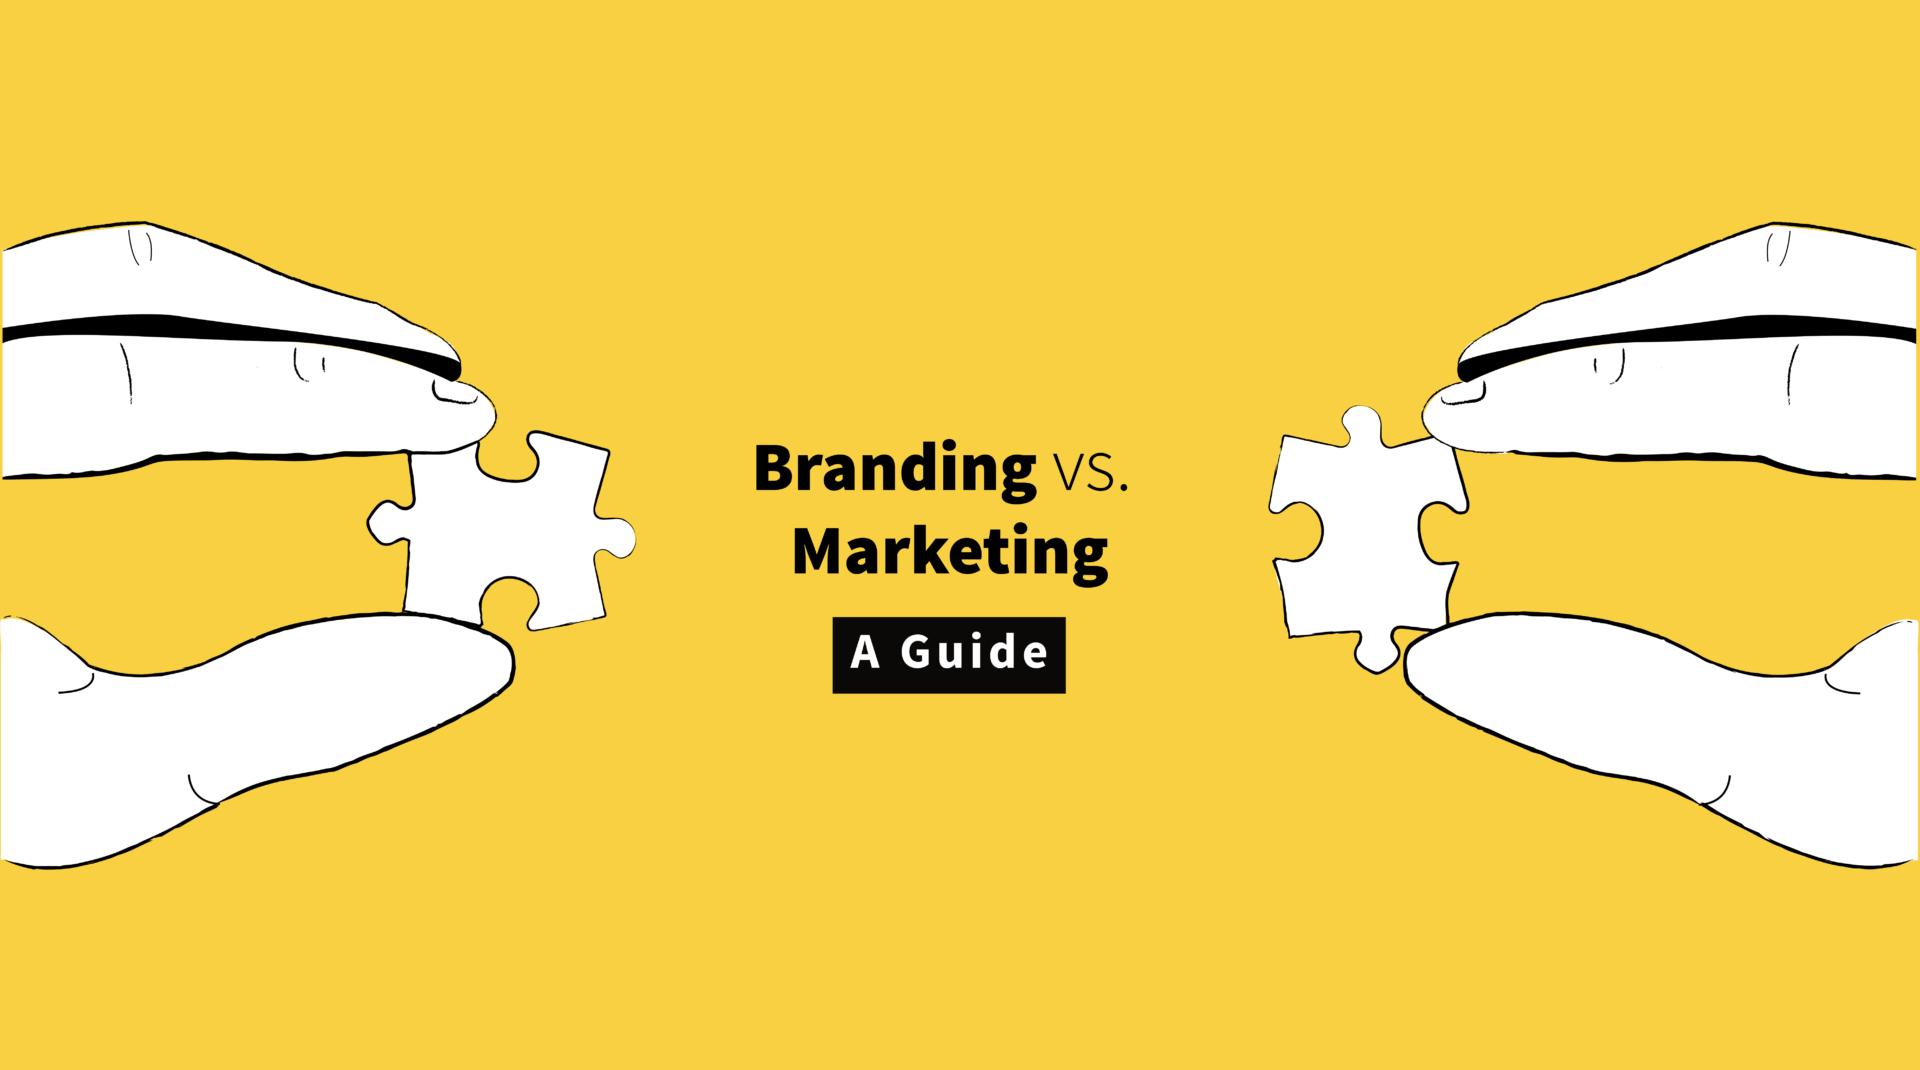 Branding vs Marketing: A Guide